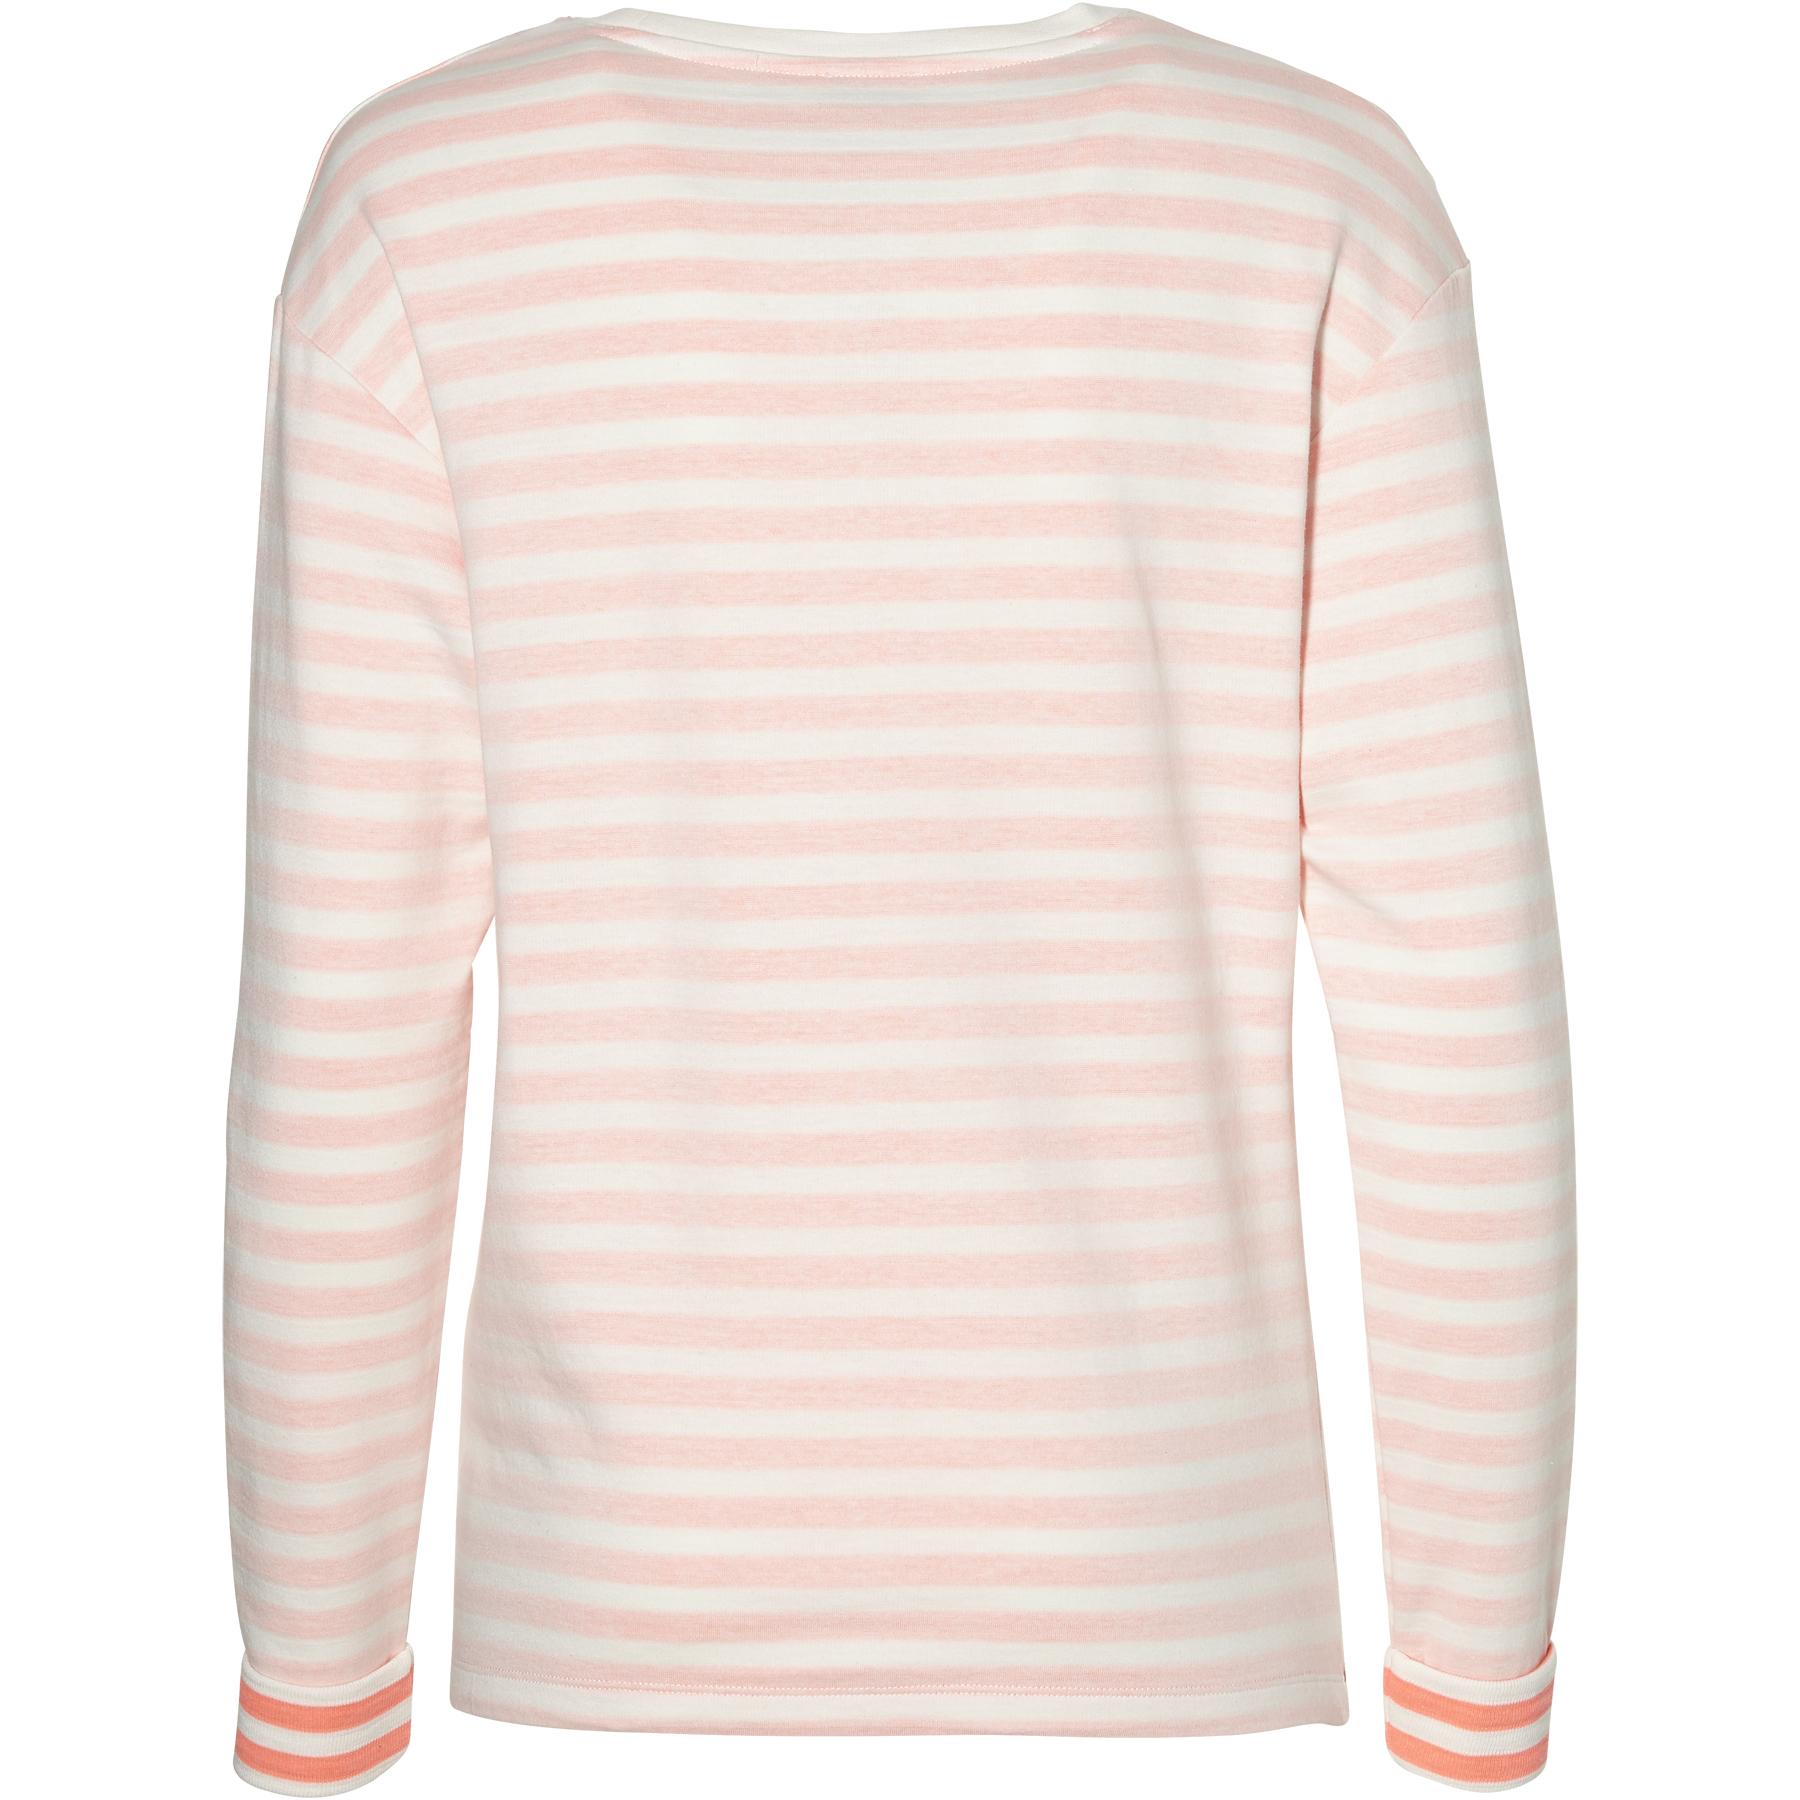 ONeill Damen Lw Essentials Logo Crew Sweatshirts